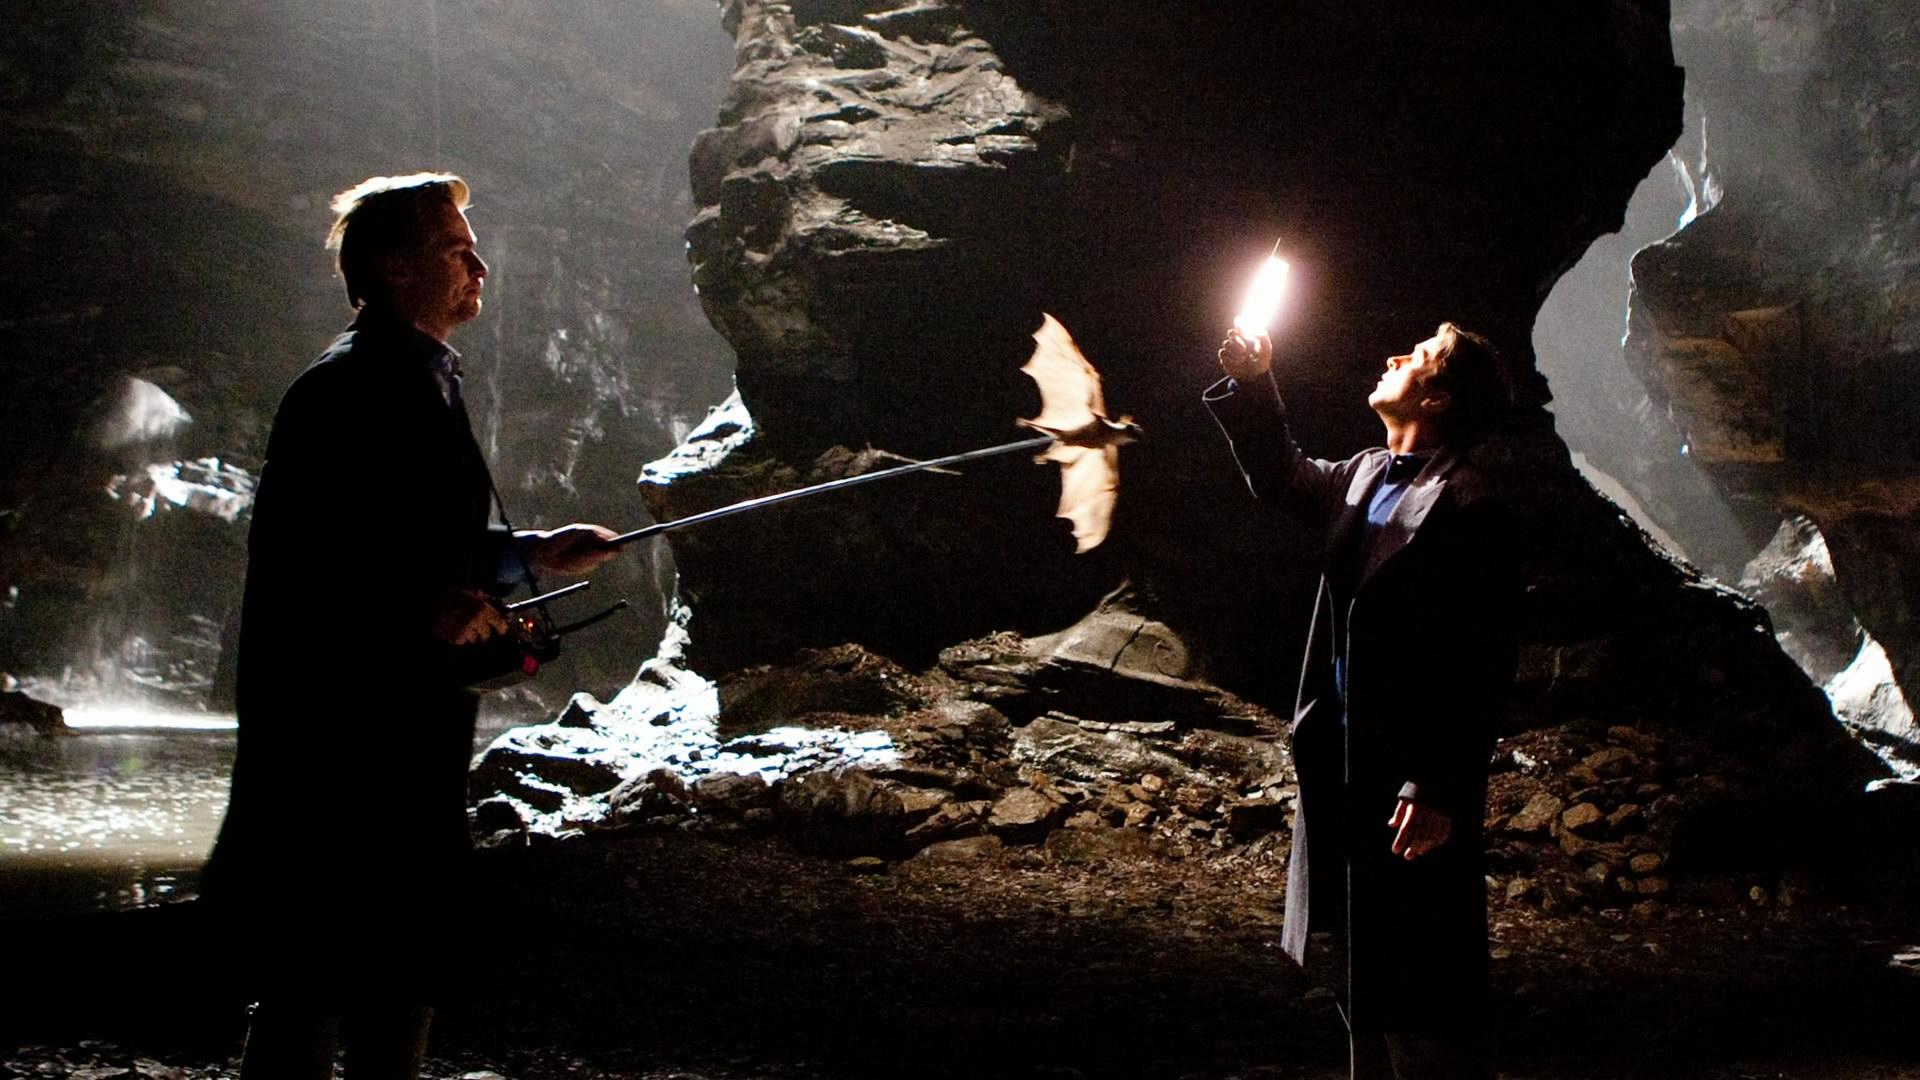 everything-batman-75-epic-images-in-honor-of-the-bat-batman-begins-batcave.jpeg